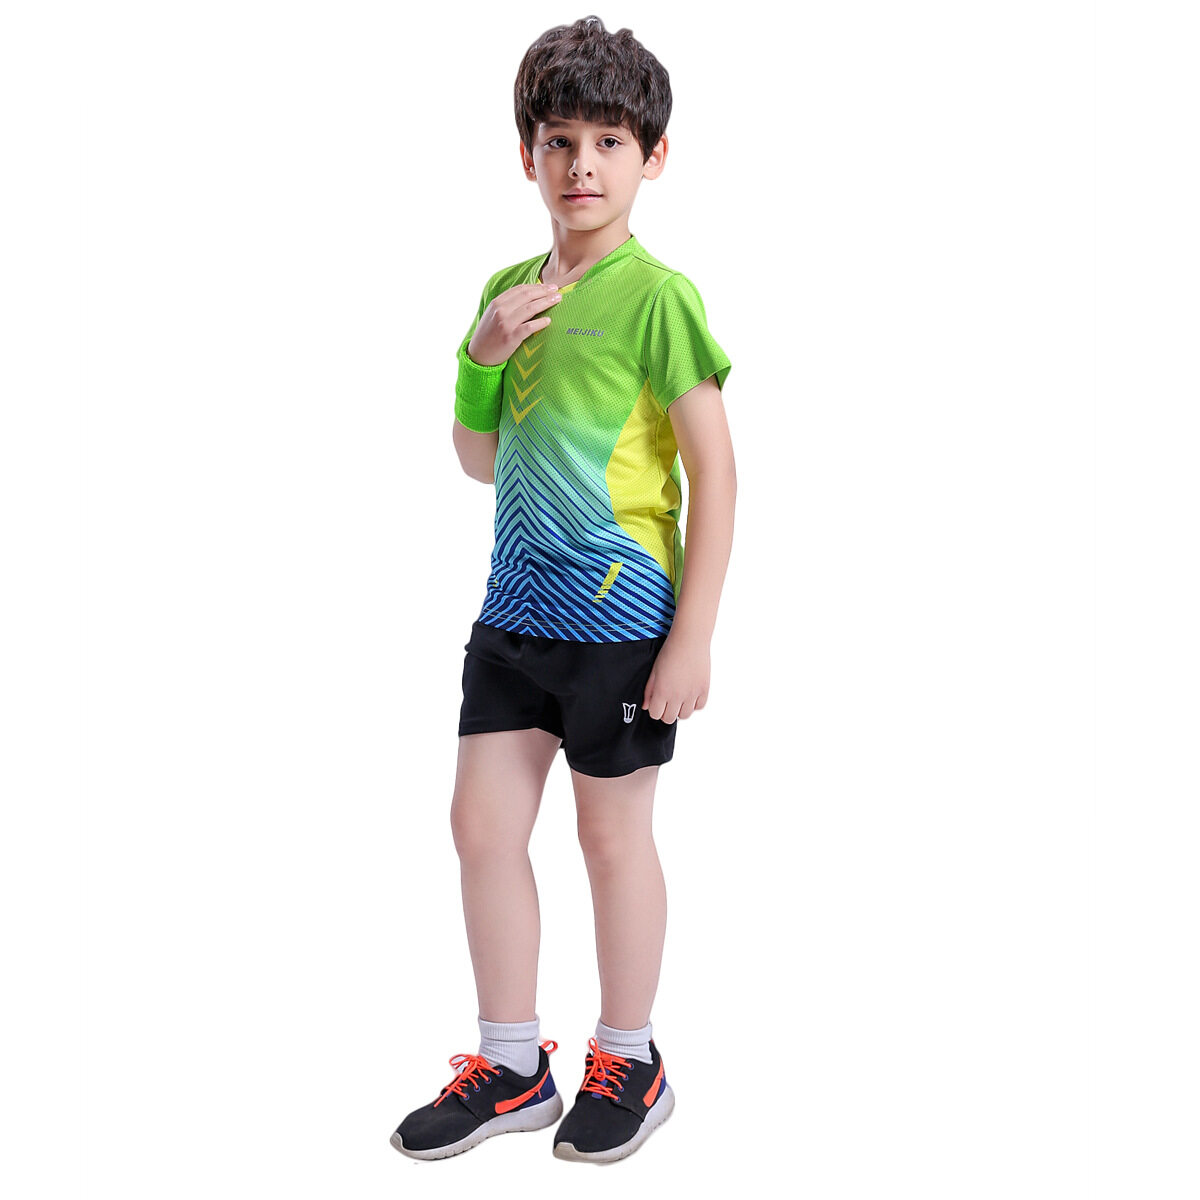 Cepat Kering Pria Basket Olahraga Lengan Pendek V Neck T Shirt Hitam Aonijie 6026 Men Quick Dry Baju White Putih Source Anak